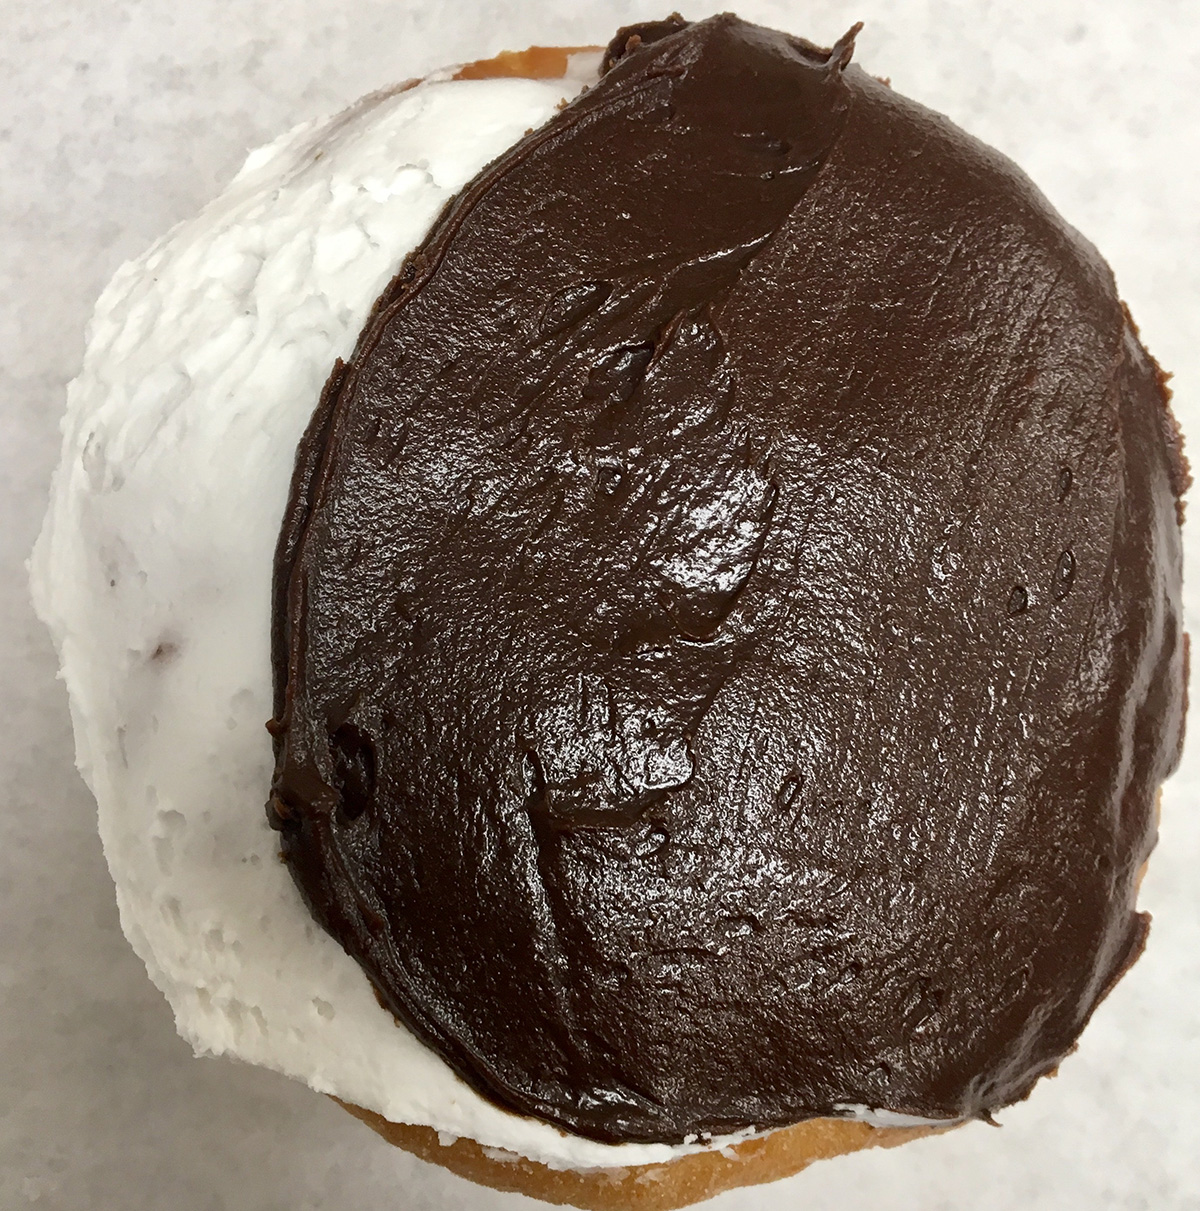 Kane's solar eclipse Boston cream doughnut